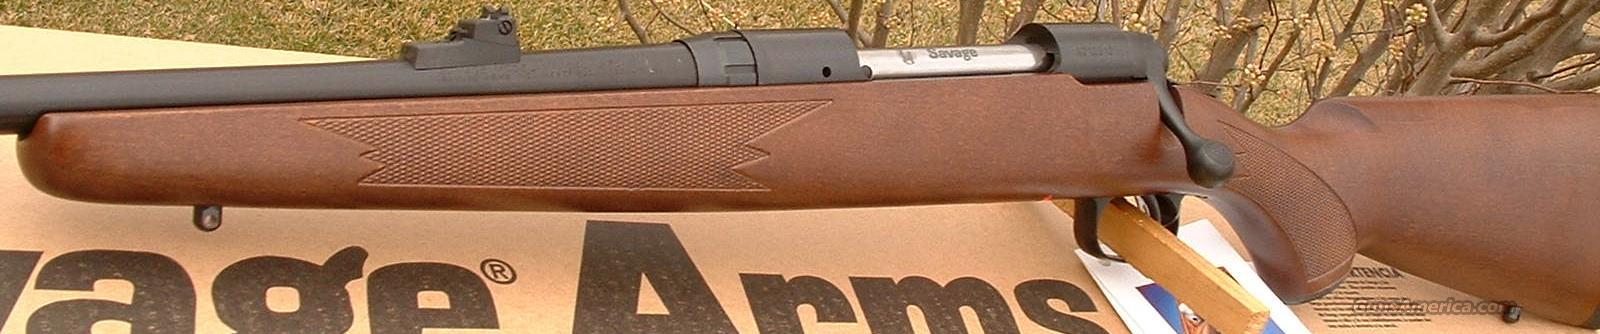 Savage Model 111 GLNS 30-06 Hunter  NEW!  Guns > Rifles > Savage Rifles